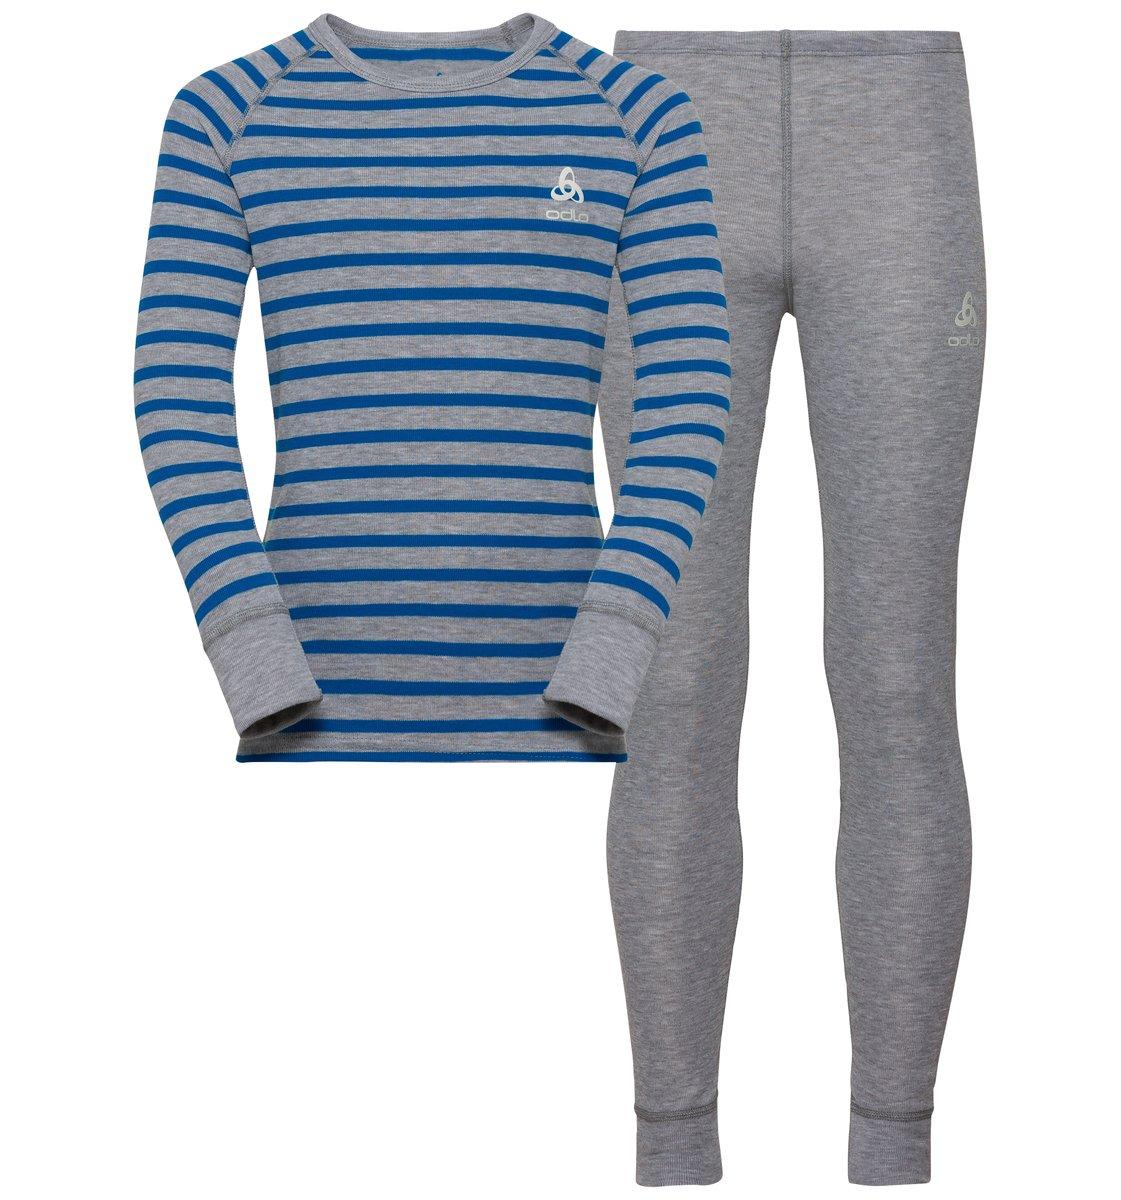 Odlo ACTIVE WARM KIDS Funktionsunterwäsche Set - grau/blau